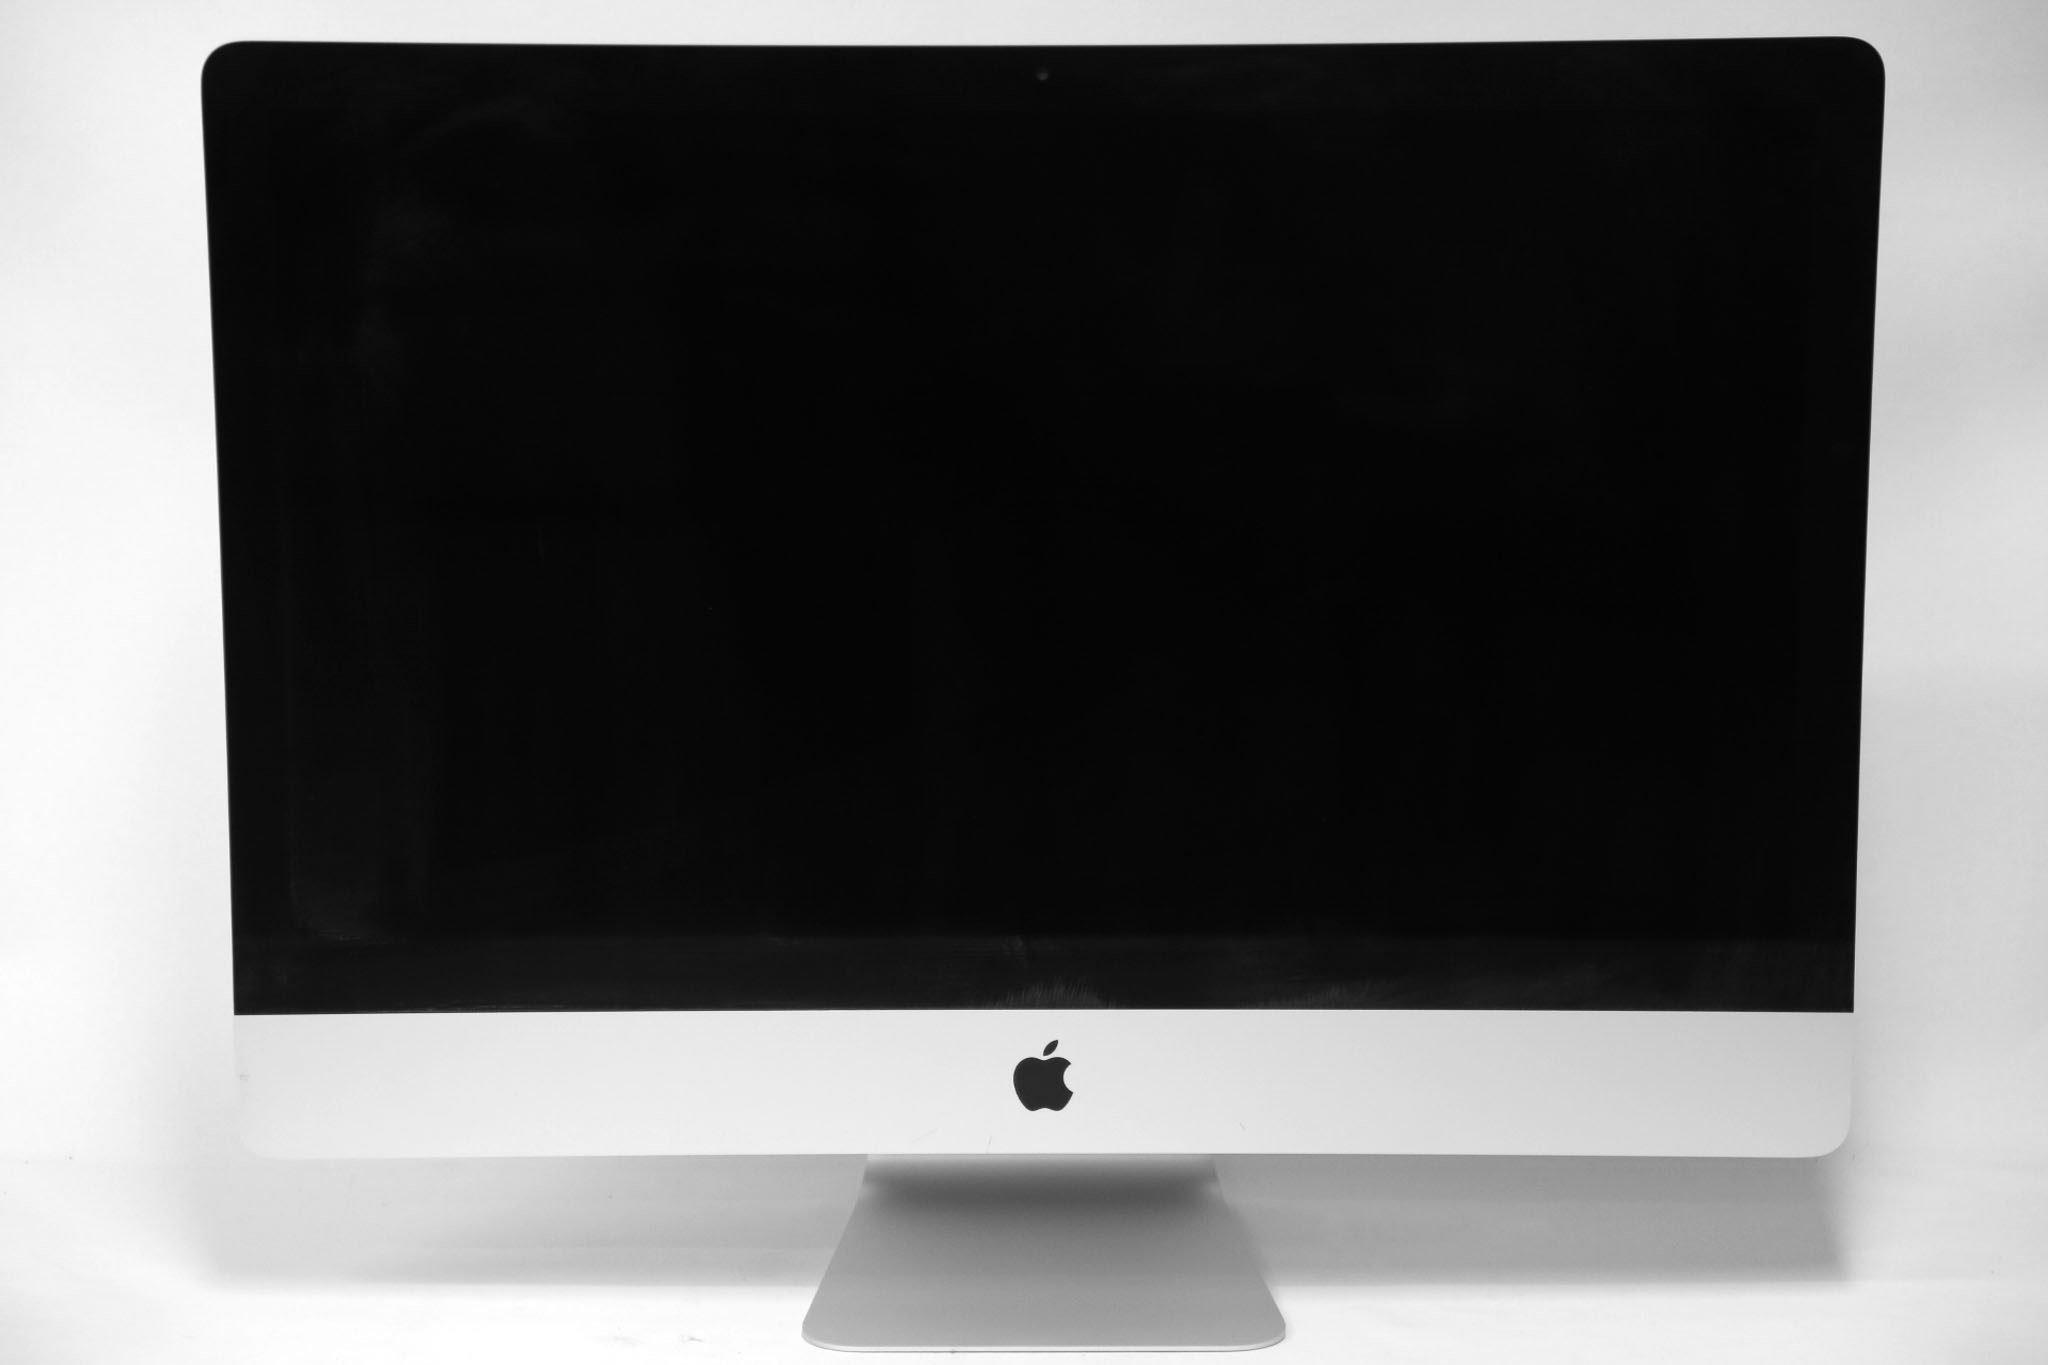 iMac 2009 Grafikkarte Reparatur